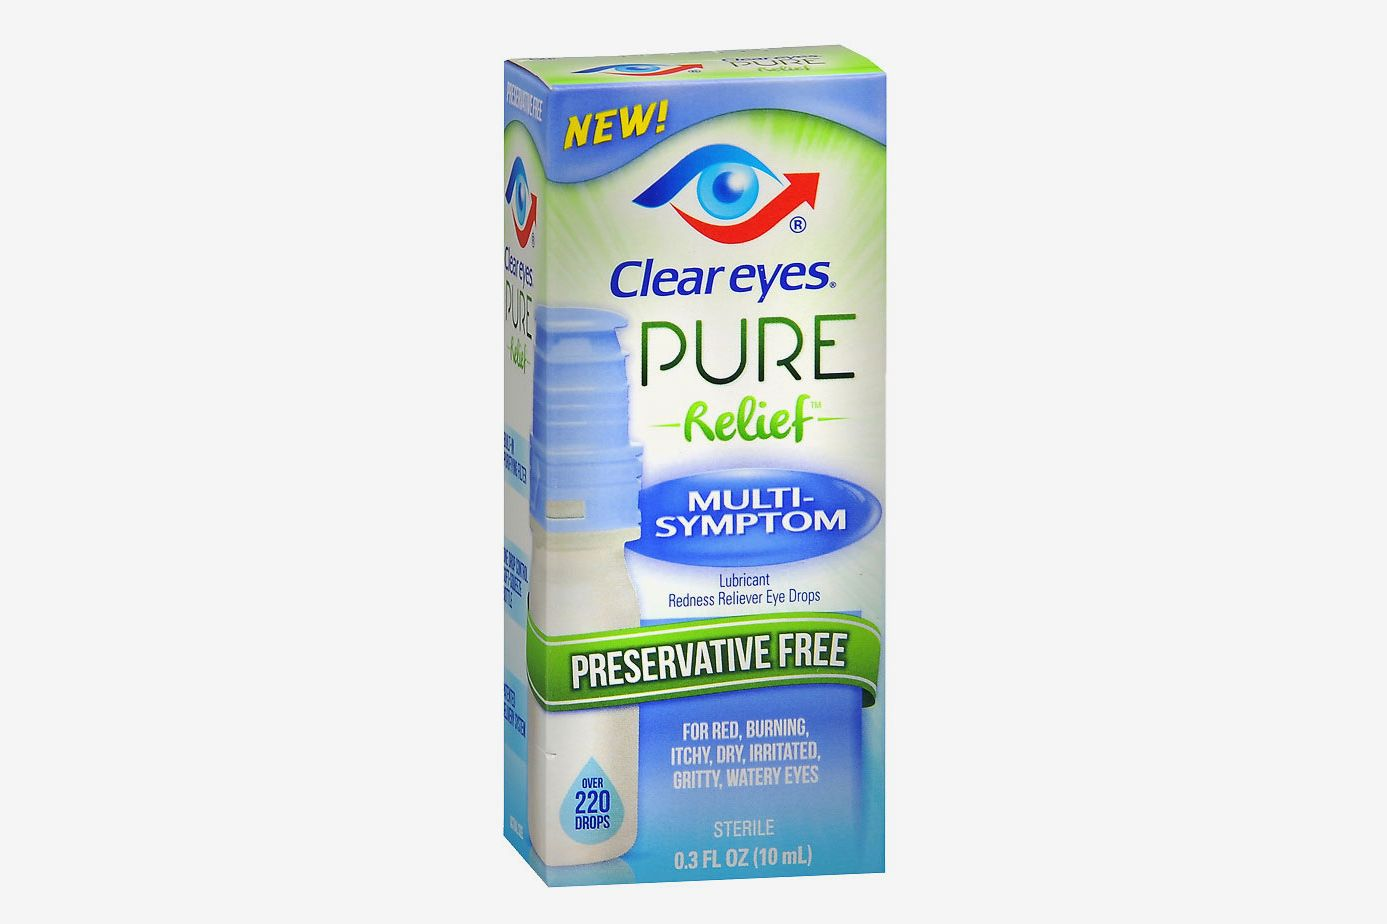 Clear Eyes Pure Multi-Symptom Relief